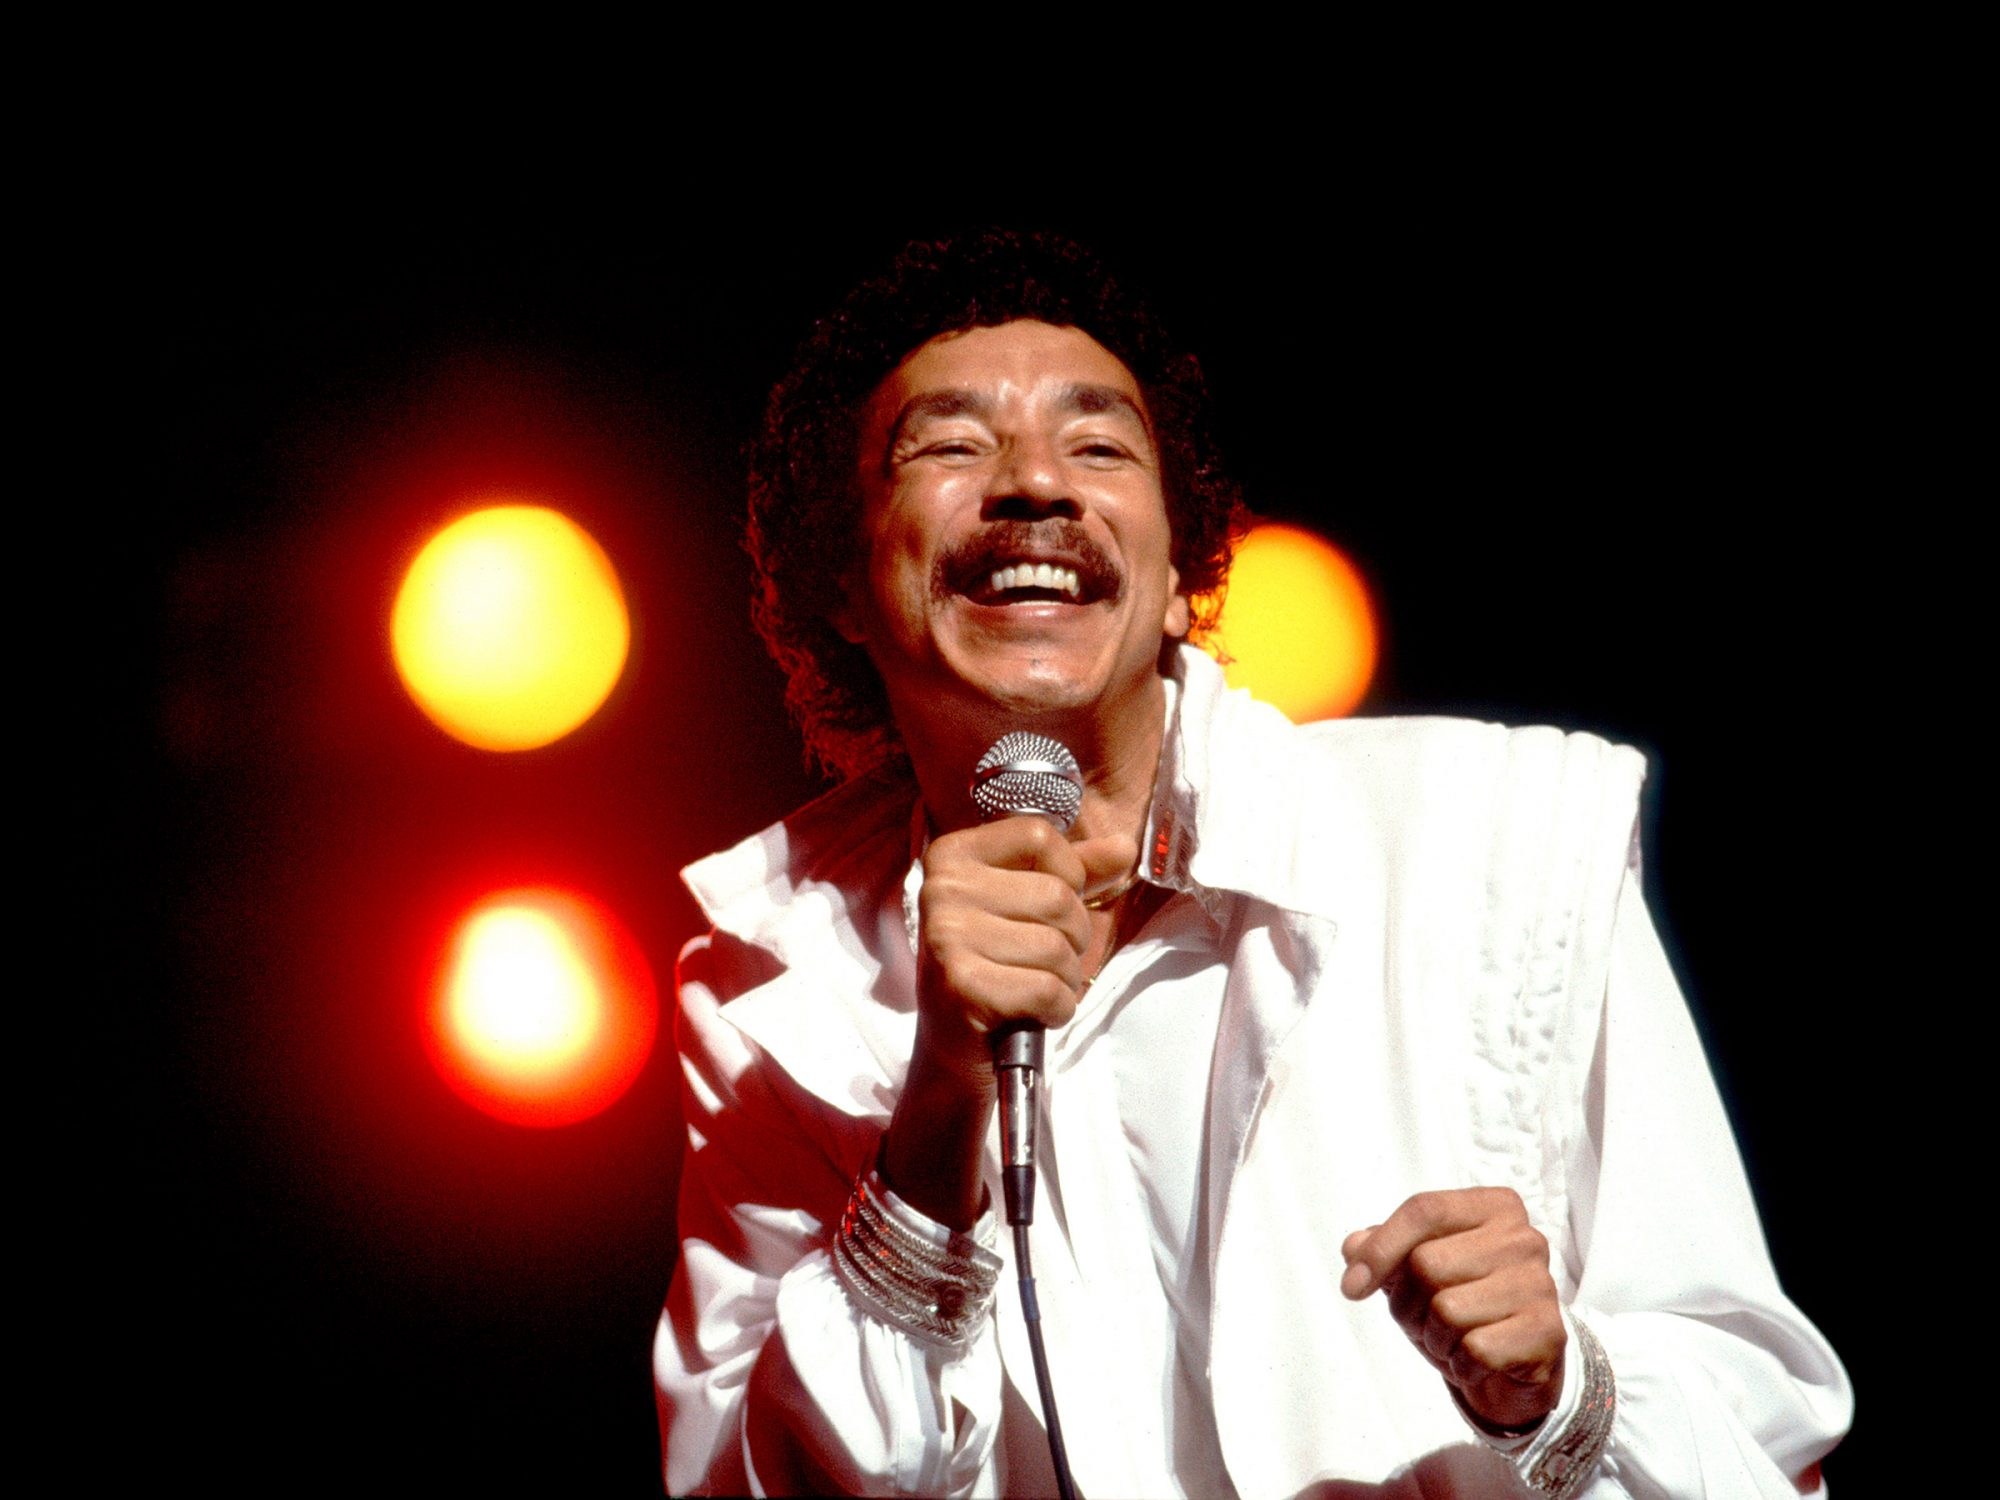 Smokey Robinson On Stage